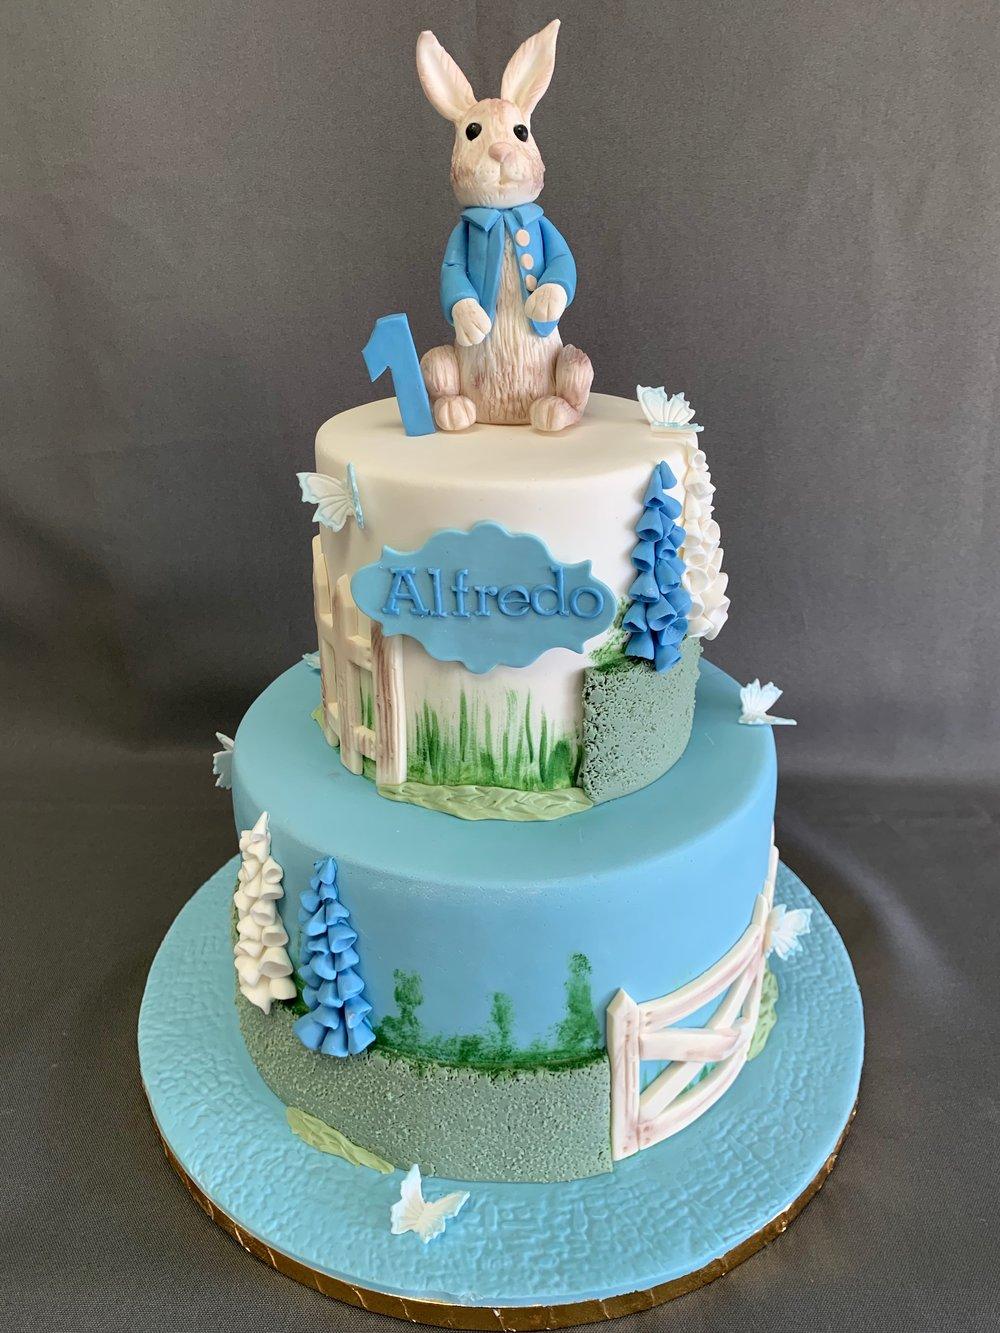 Peter Rabbit 1st Birthday Cake NJ